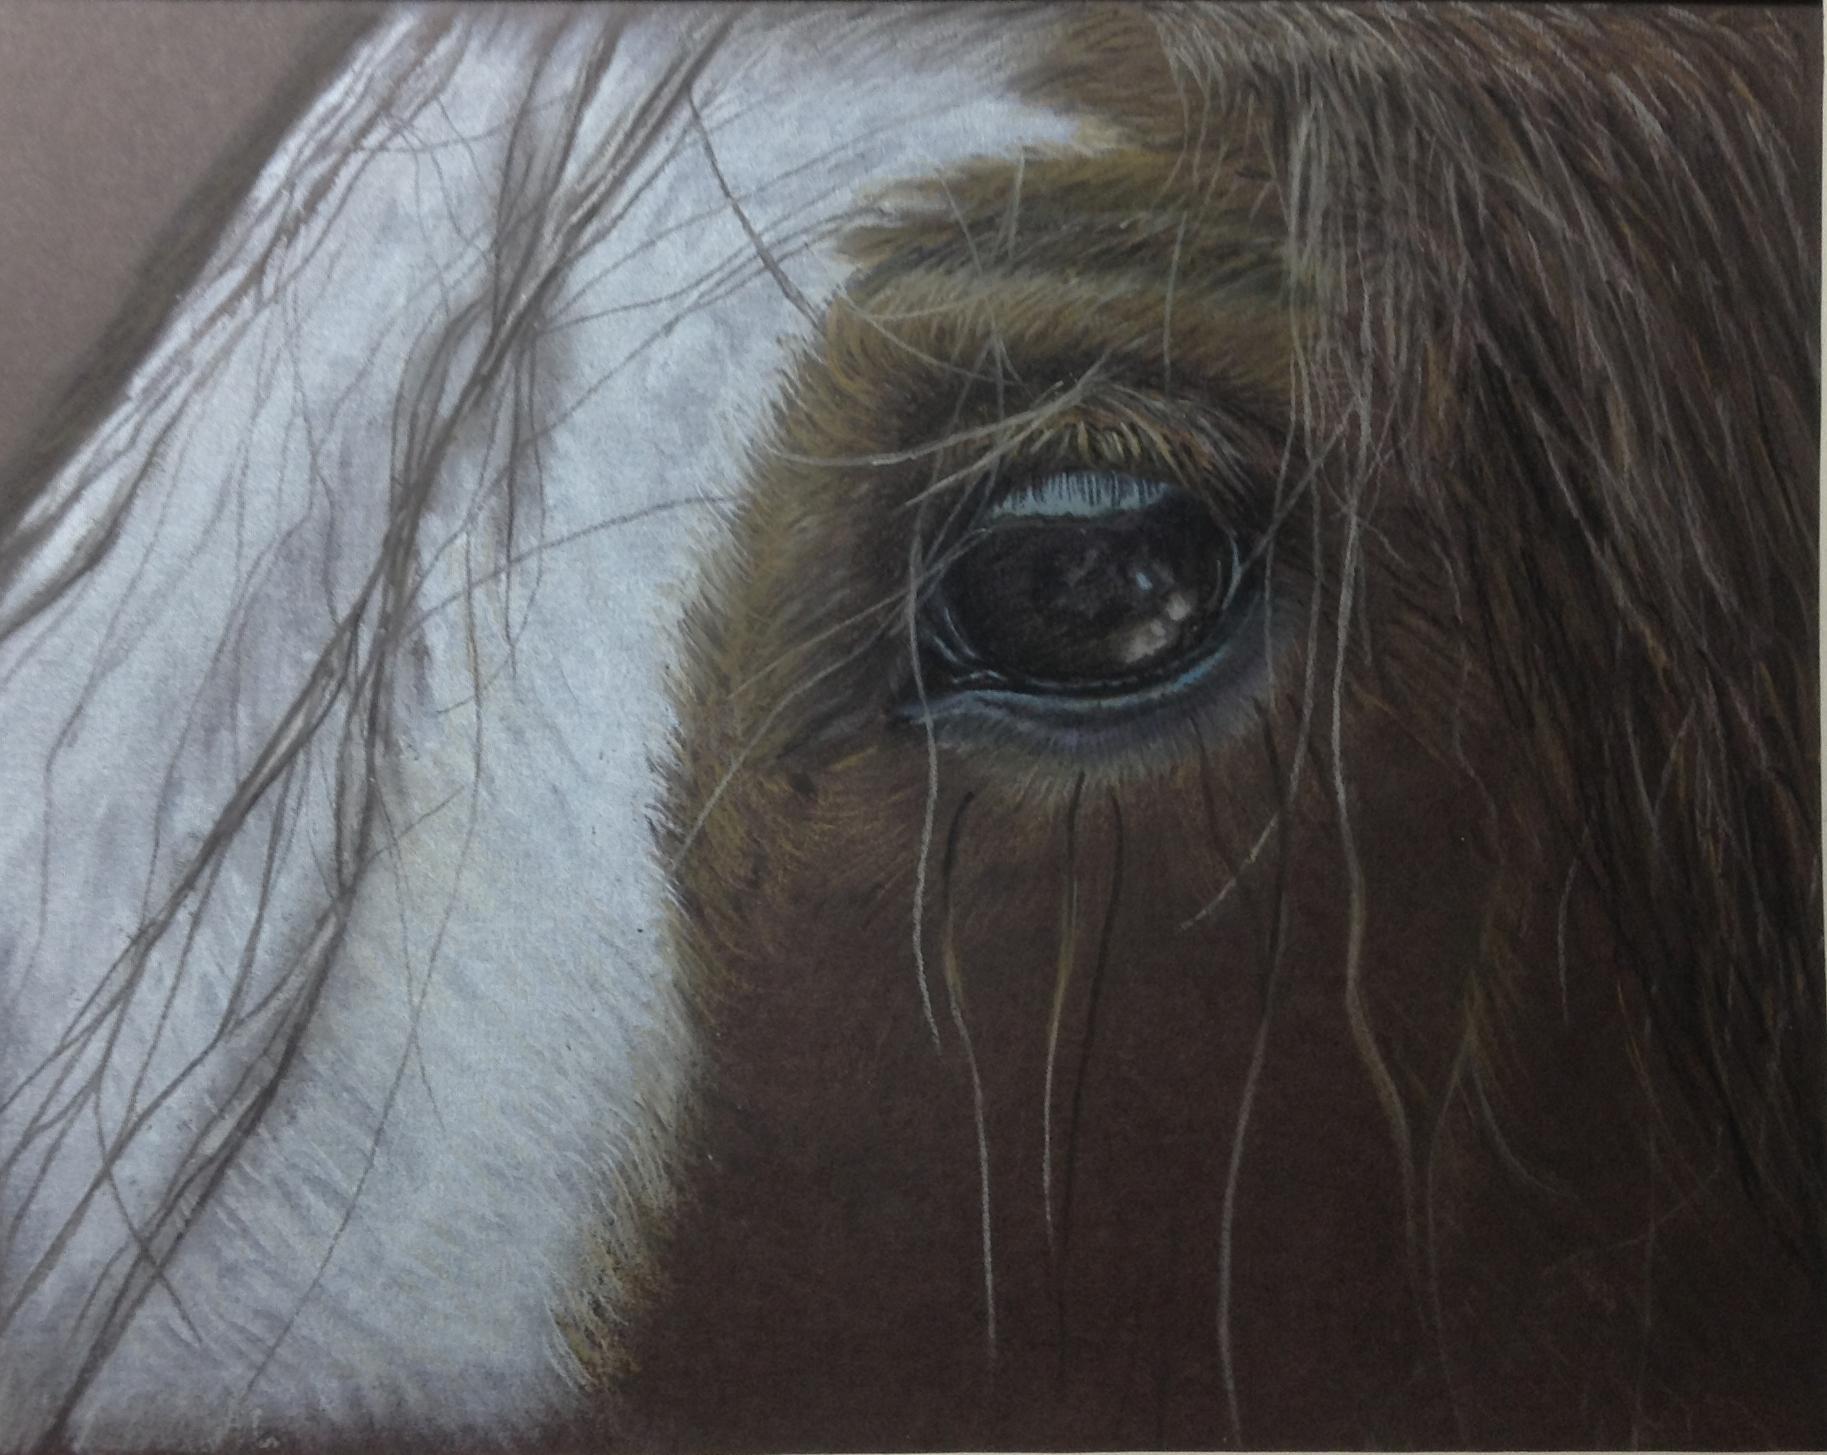 Brown horse eye